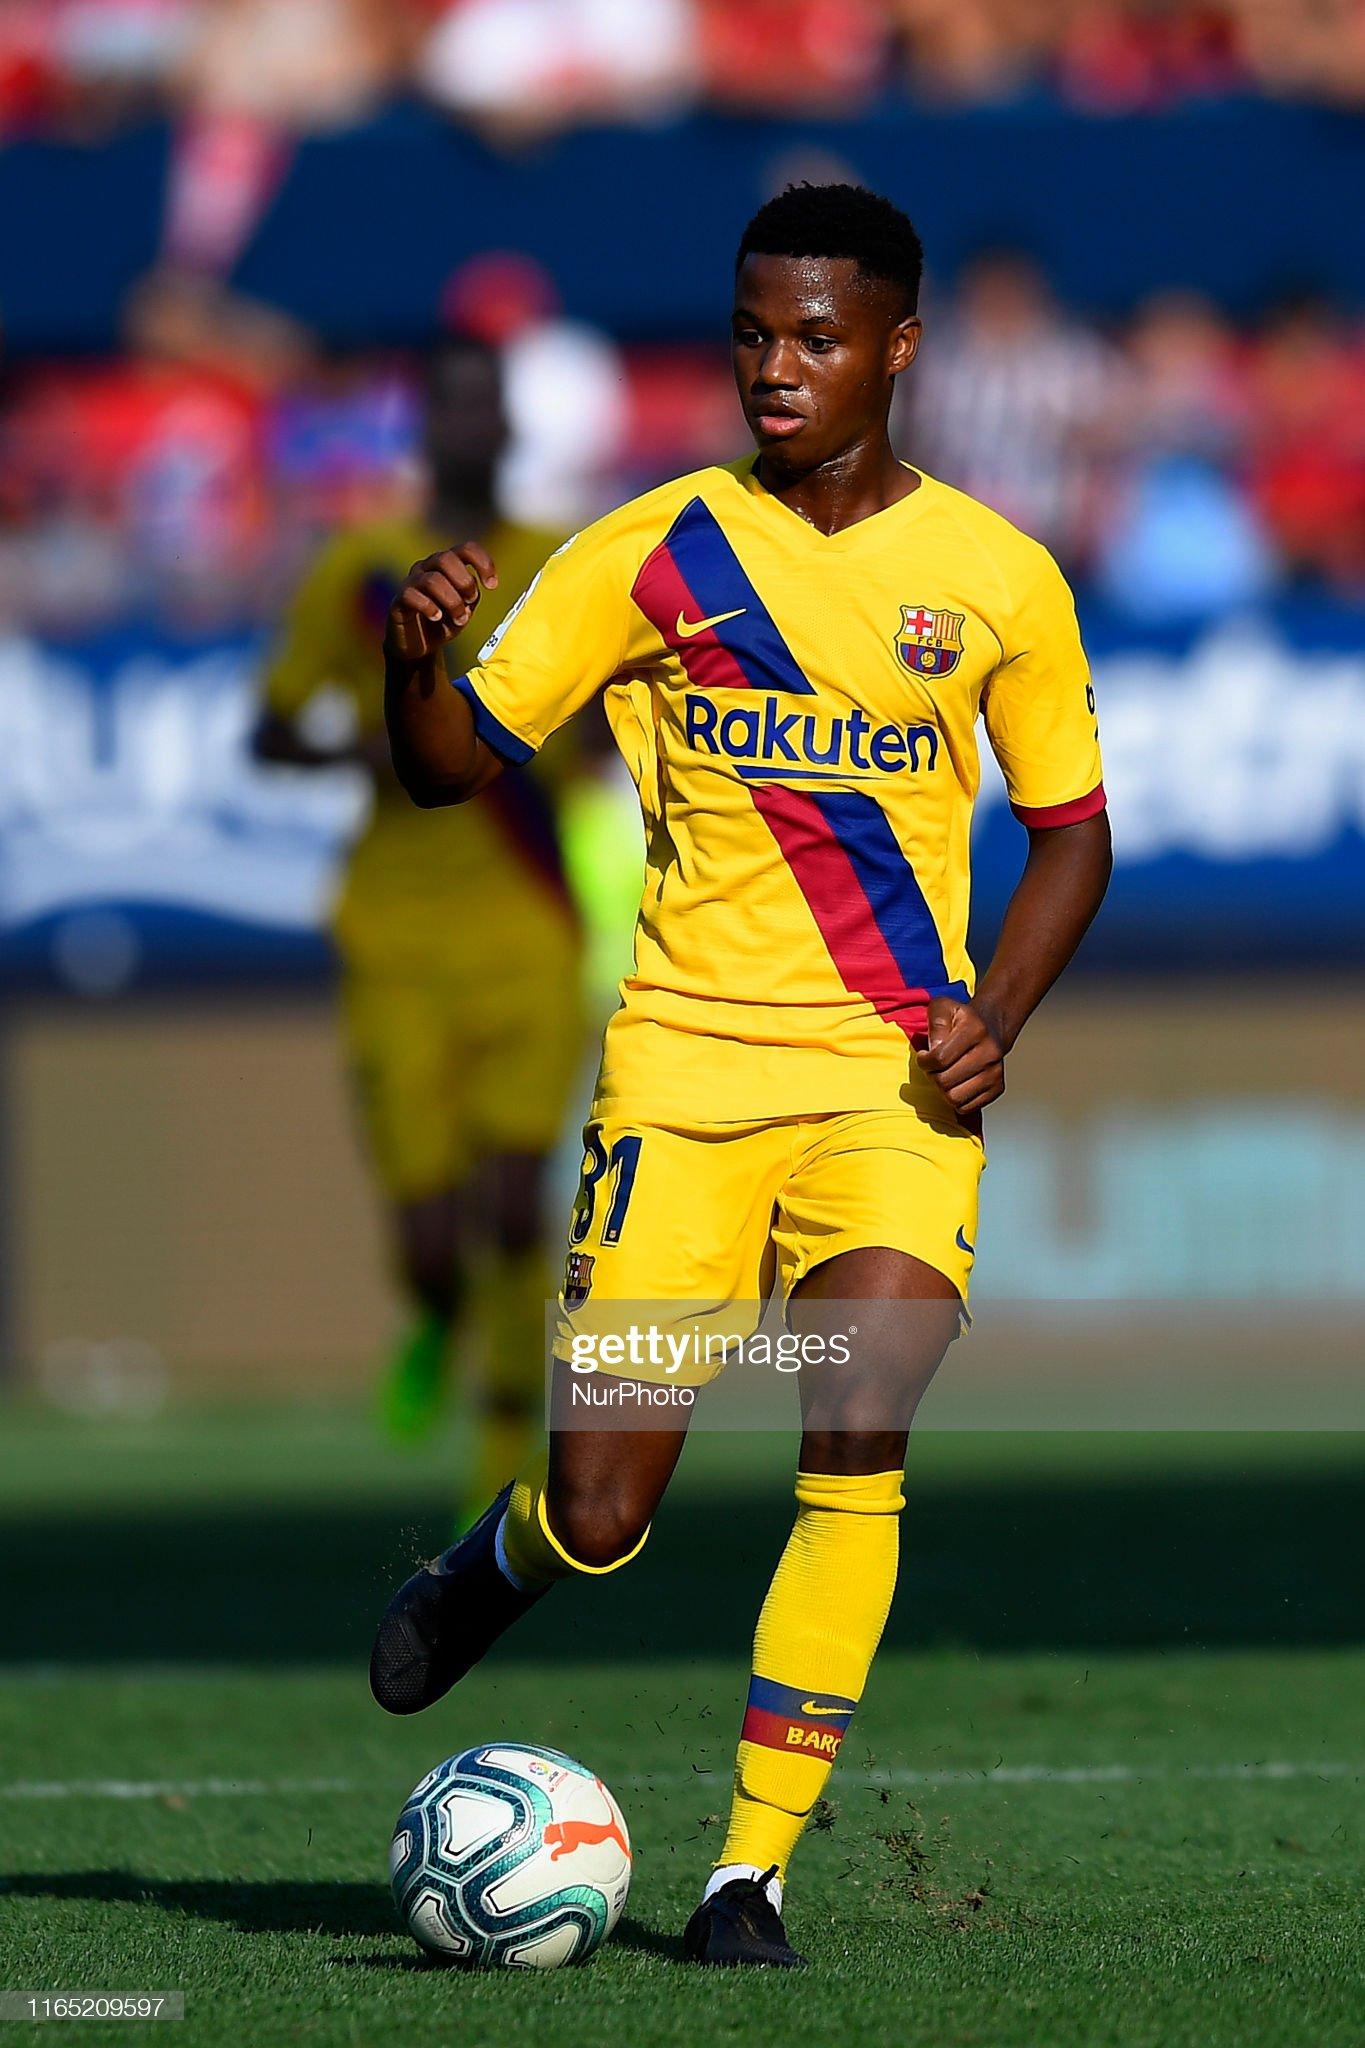 صور مباراة : أوساسونا - برشلونة 2-2 ( 31-08-2019 )  Ansu-fati-of-barcelona-in-action-during-the-liga-match-between-ca-picture-id1165209597?s=2048x2048